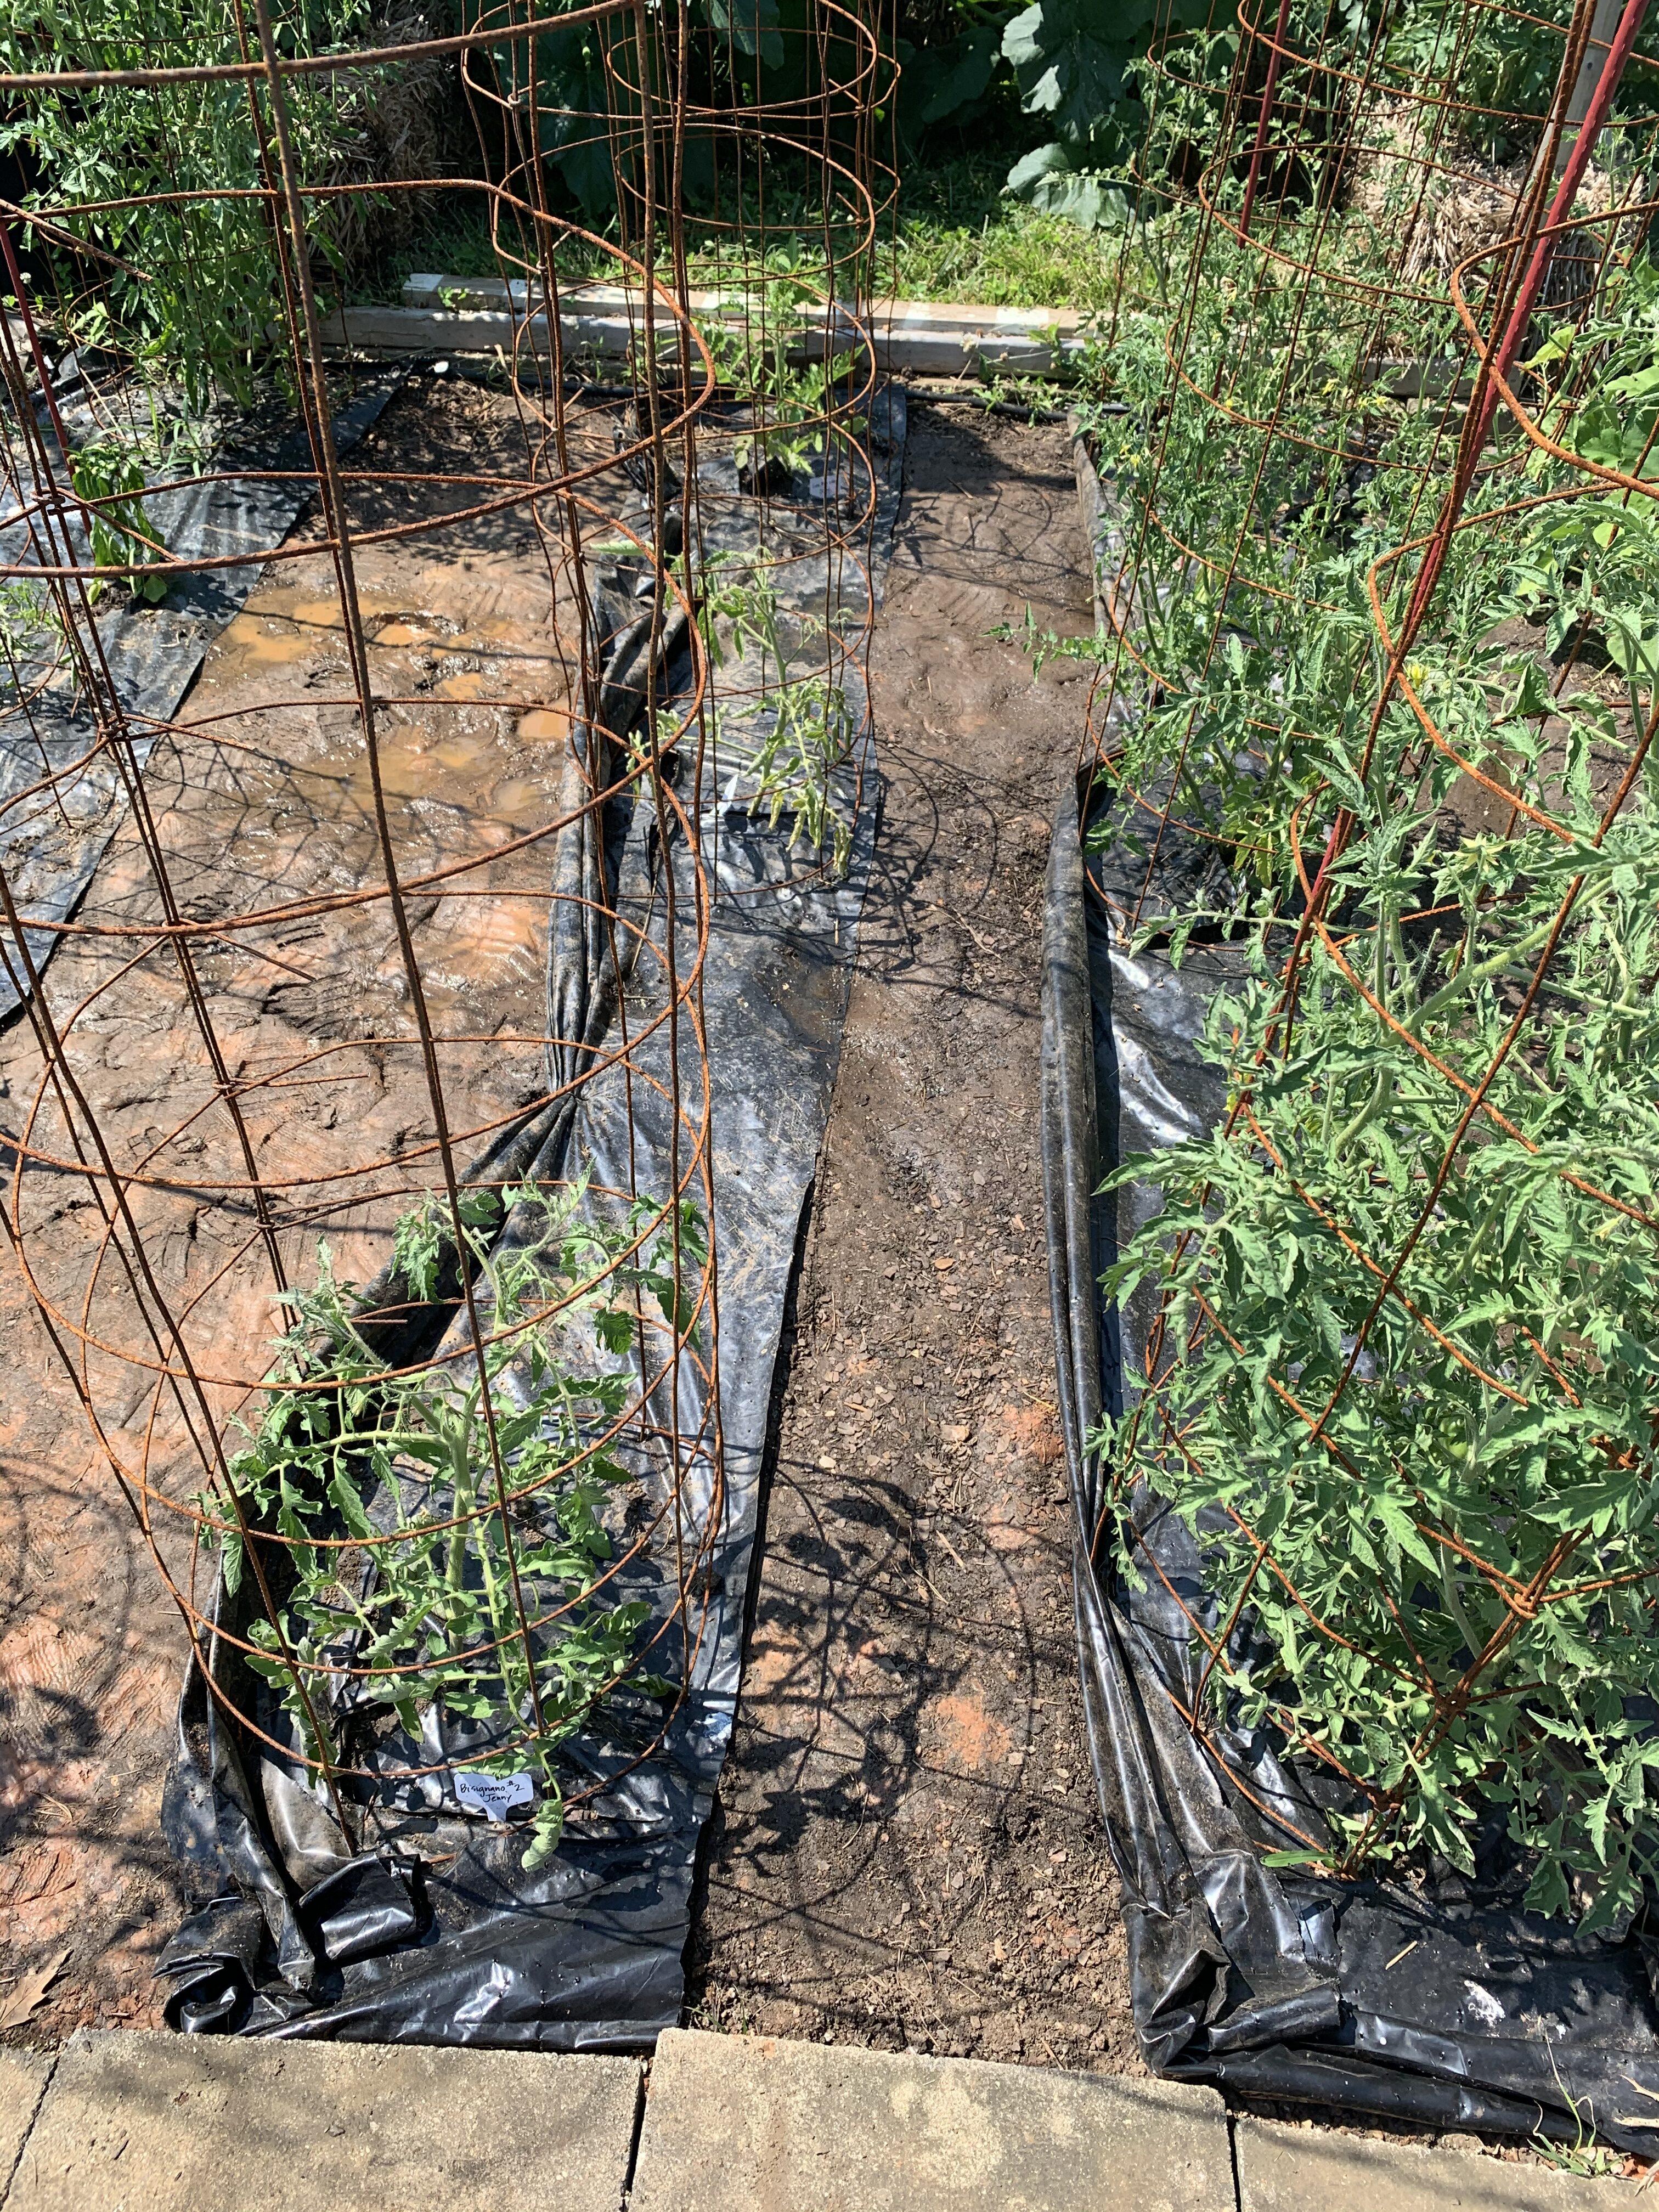 17467EBB 2FDC 40C3 9127 9CDF160CCF09 Fourth of July Tomato!